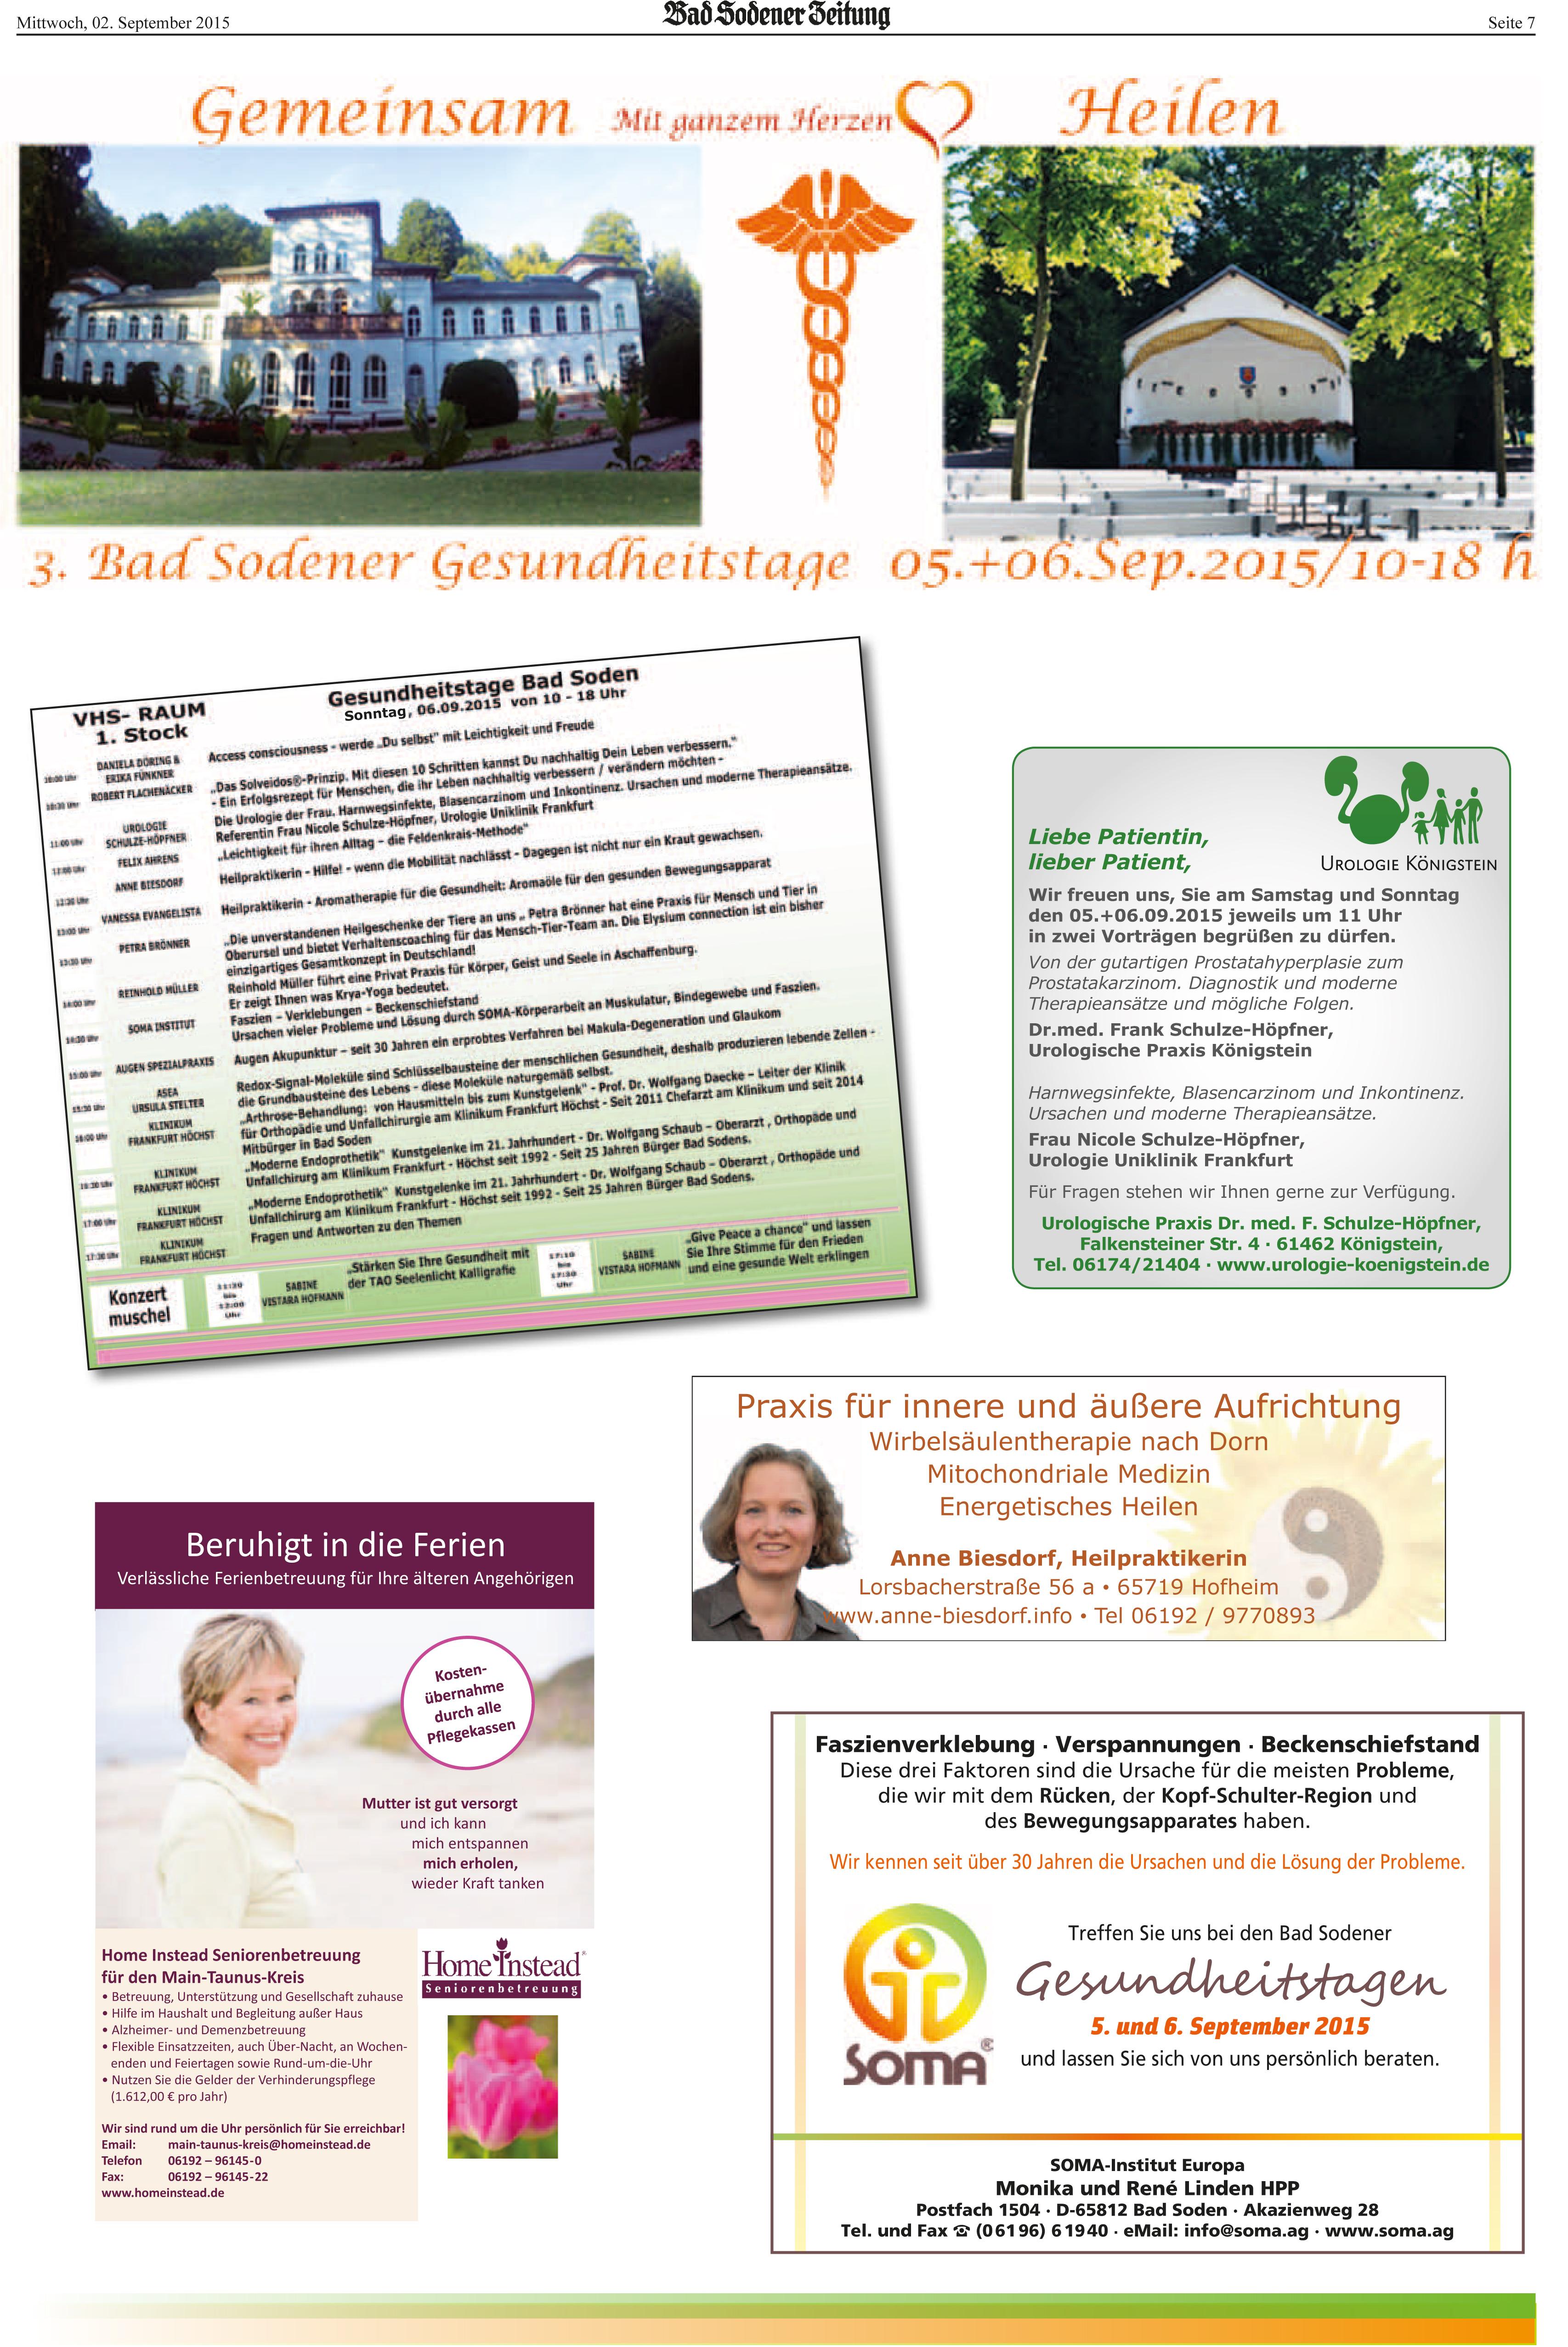 Presseartikel_Gesundheitstage-Bad Soden_02092015